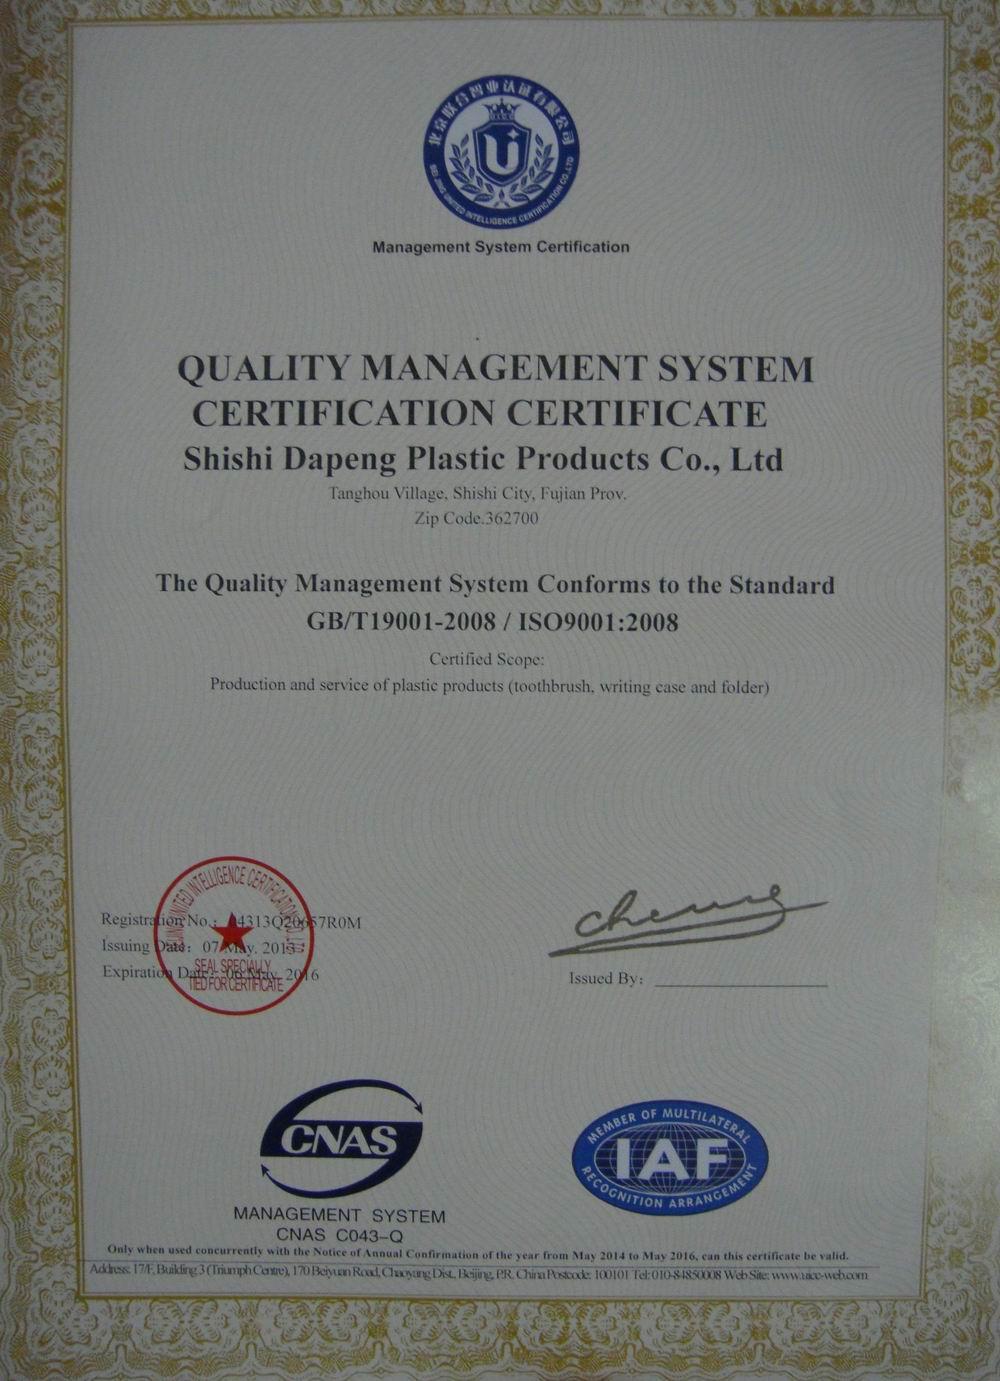 GB/T19001-2008/ISO9001:2008 standard